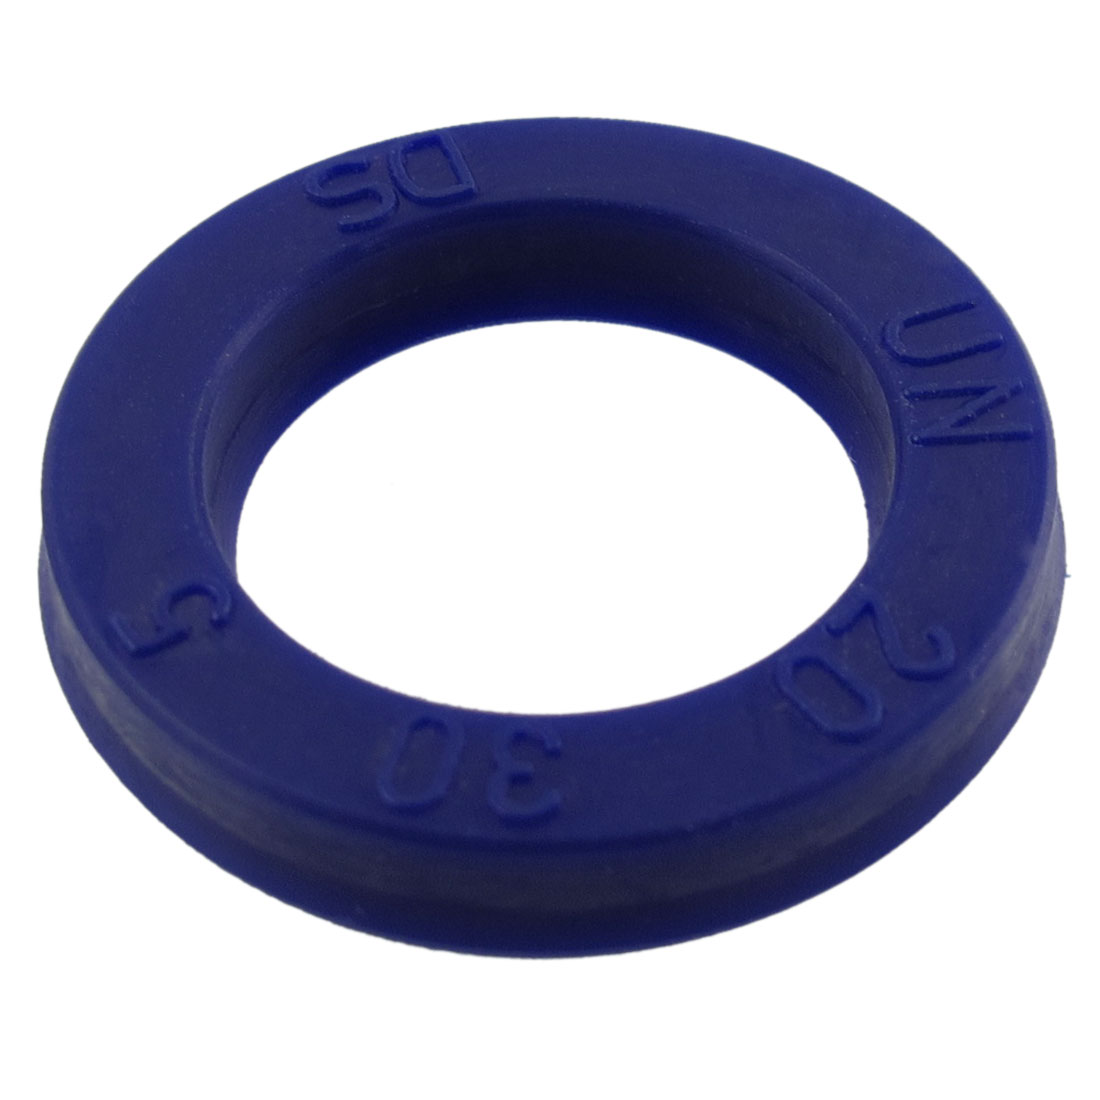 20mm x 30mm x 5mm Blue Polyurethane PU Dust Resistant Seal Gasket